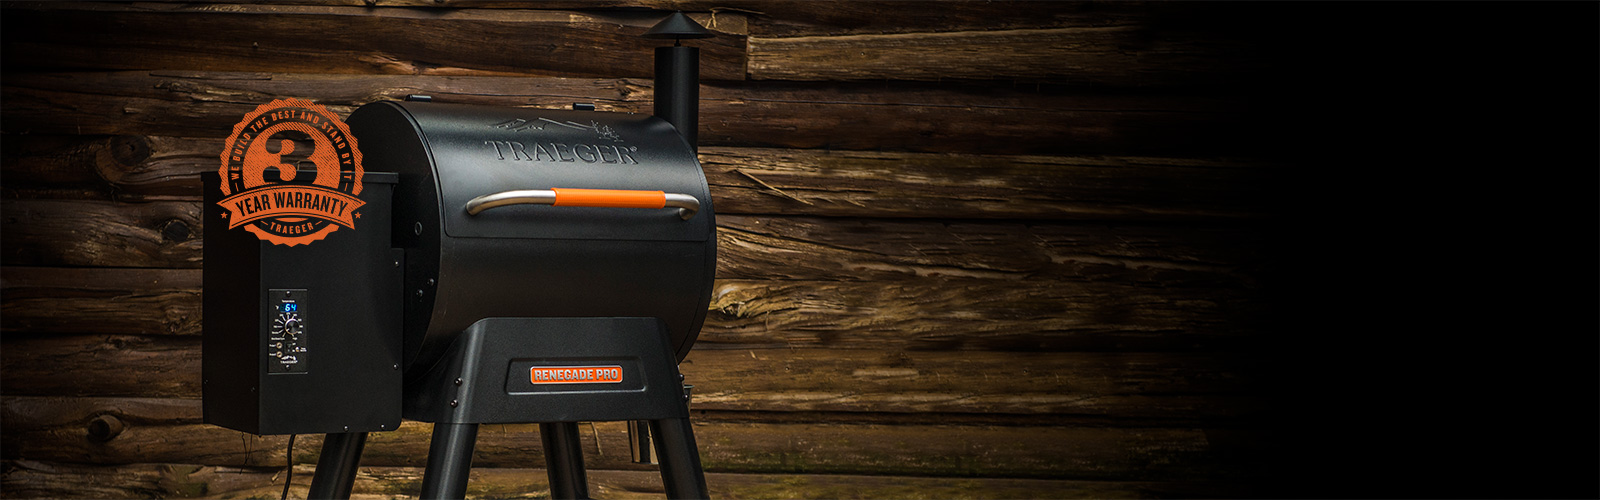 Traeger Renegrade Pro Grill